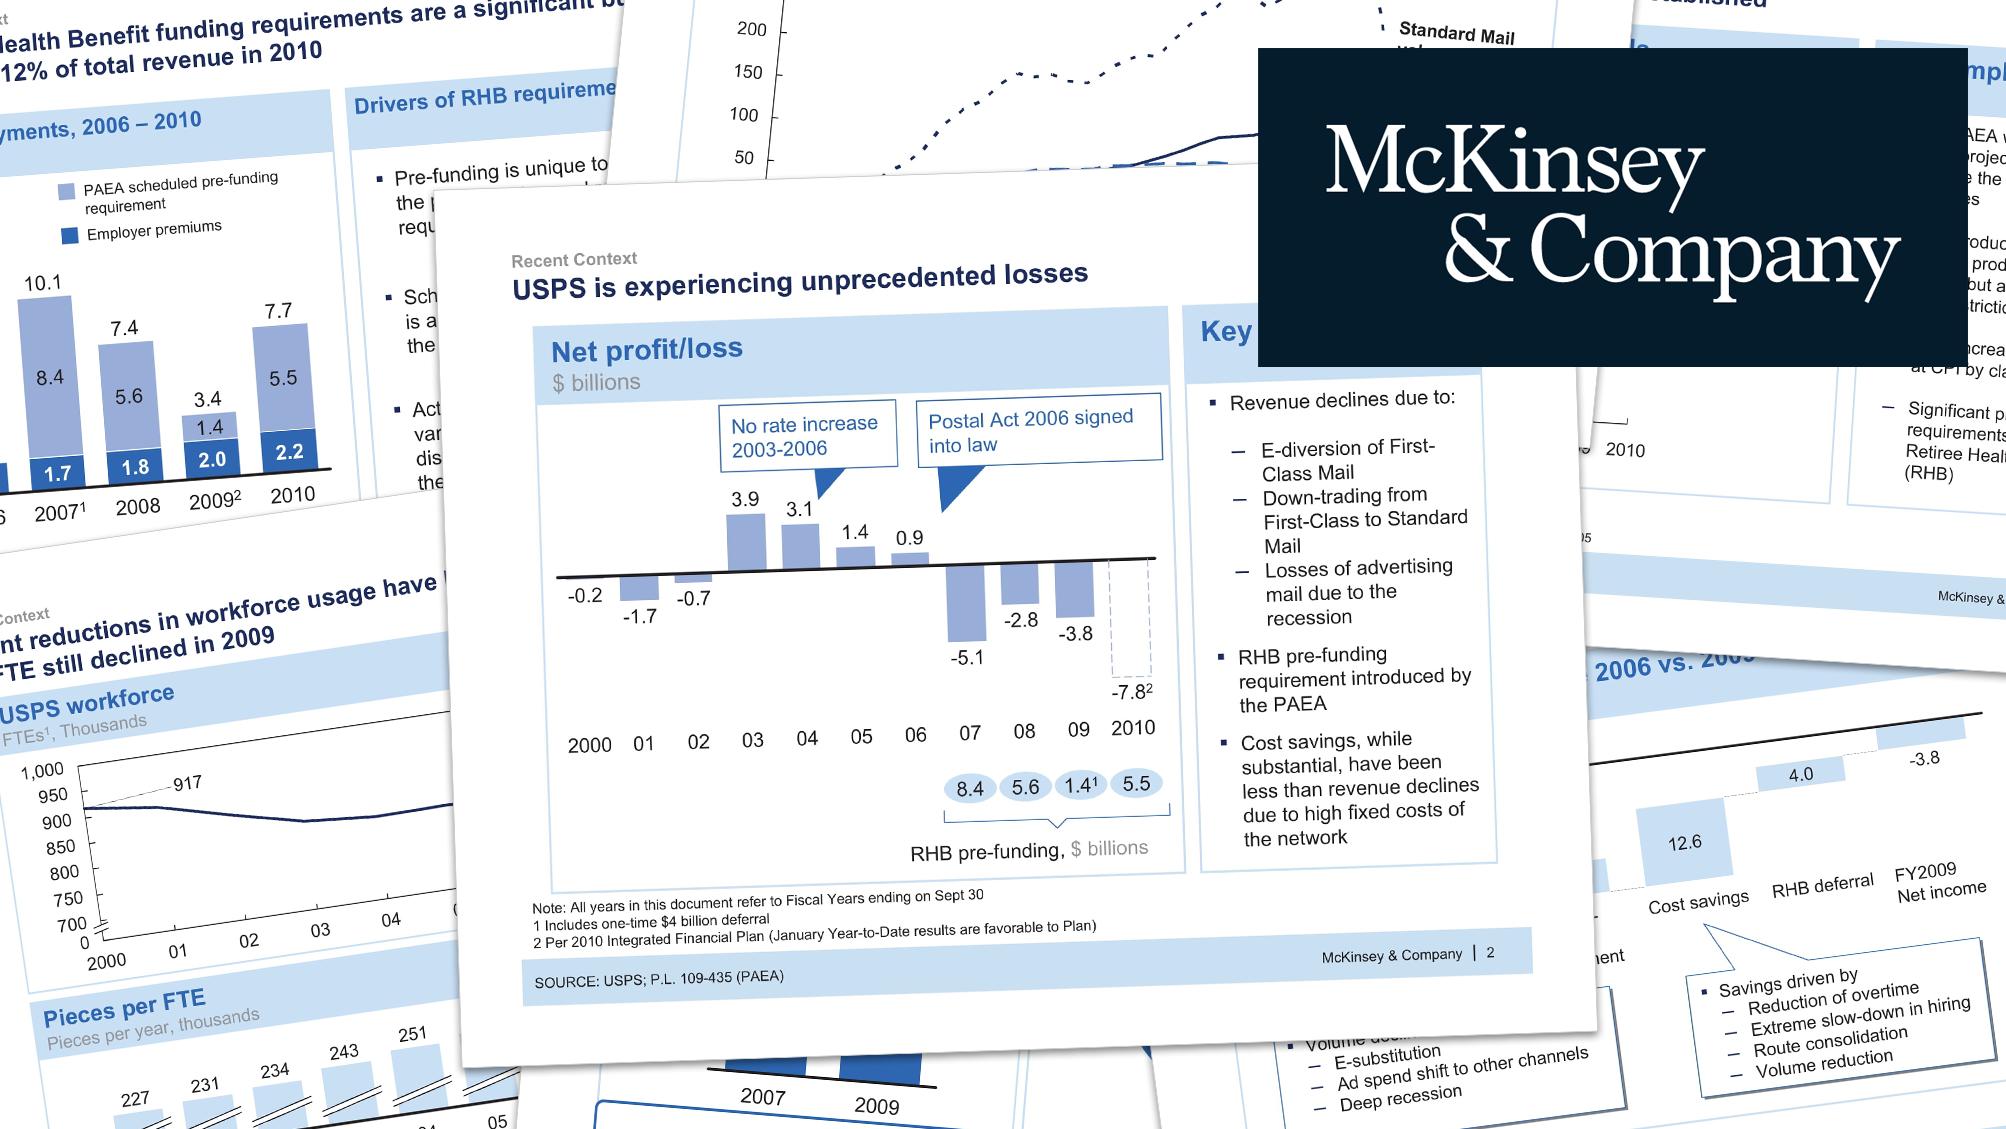 McKinsey presentations, reports and slide decks